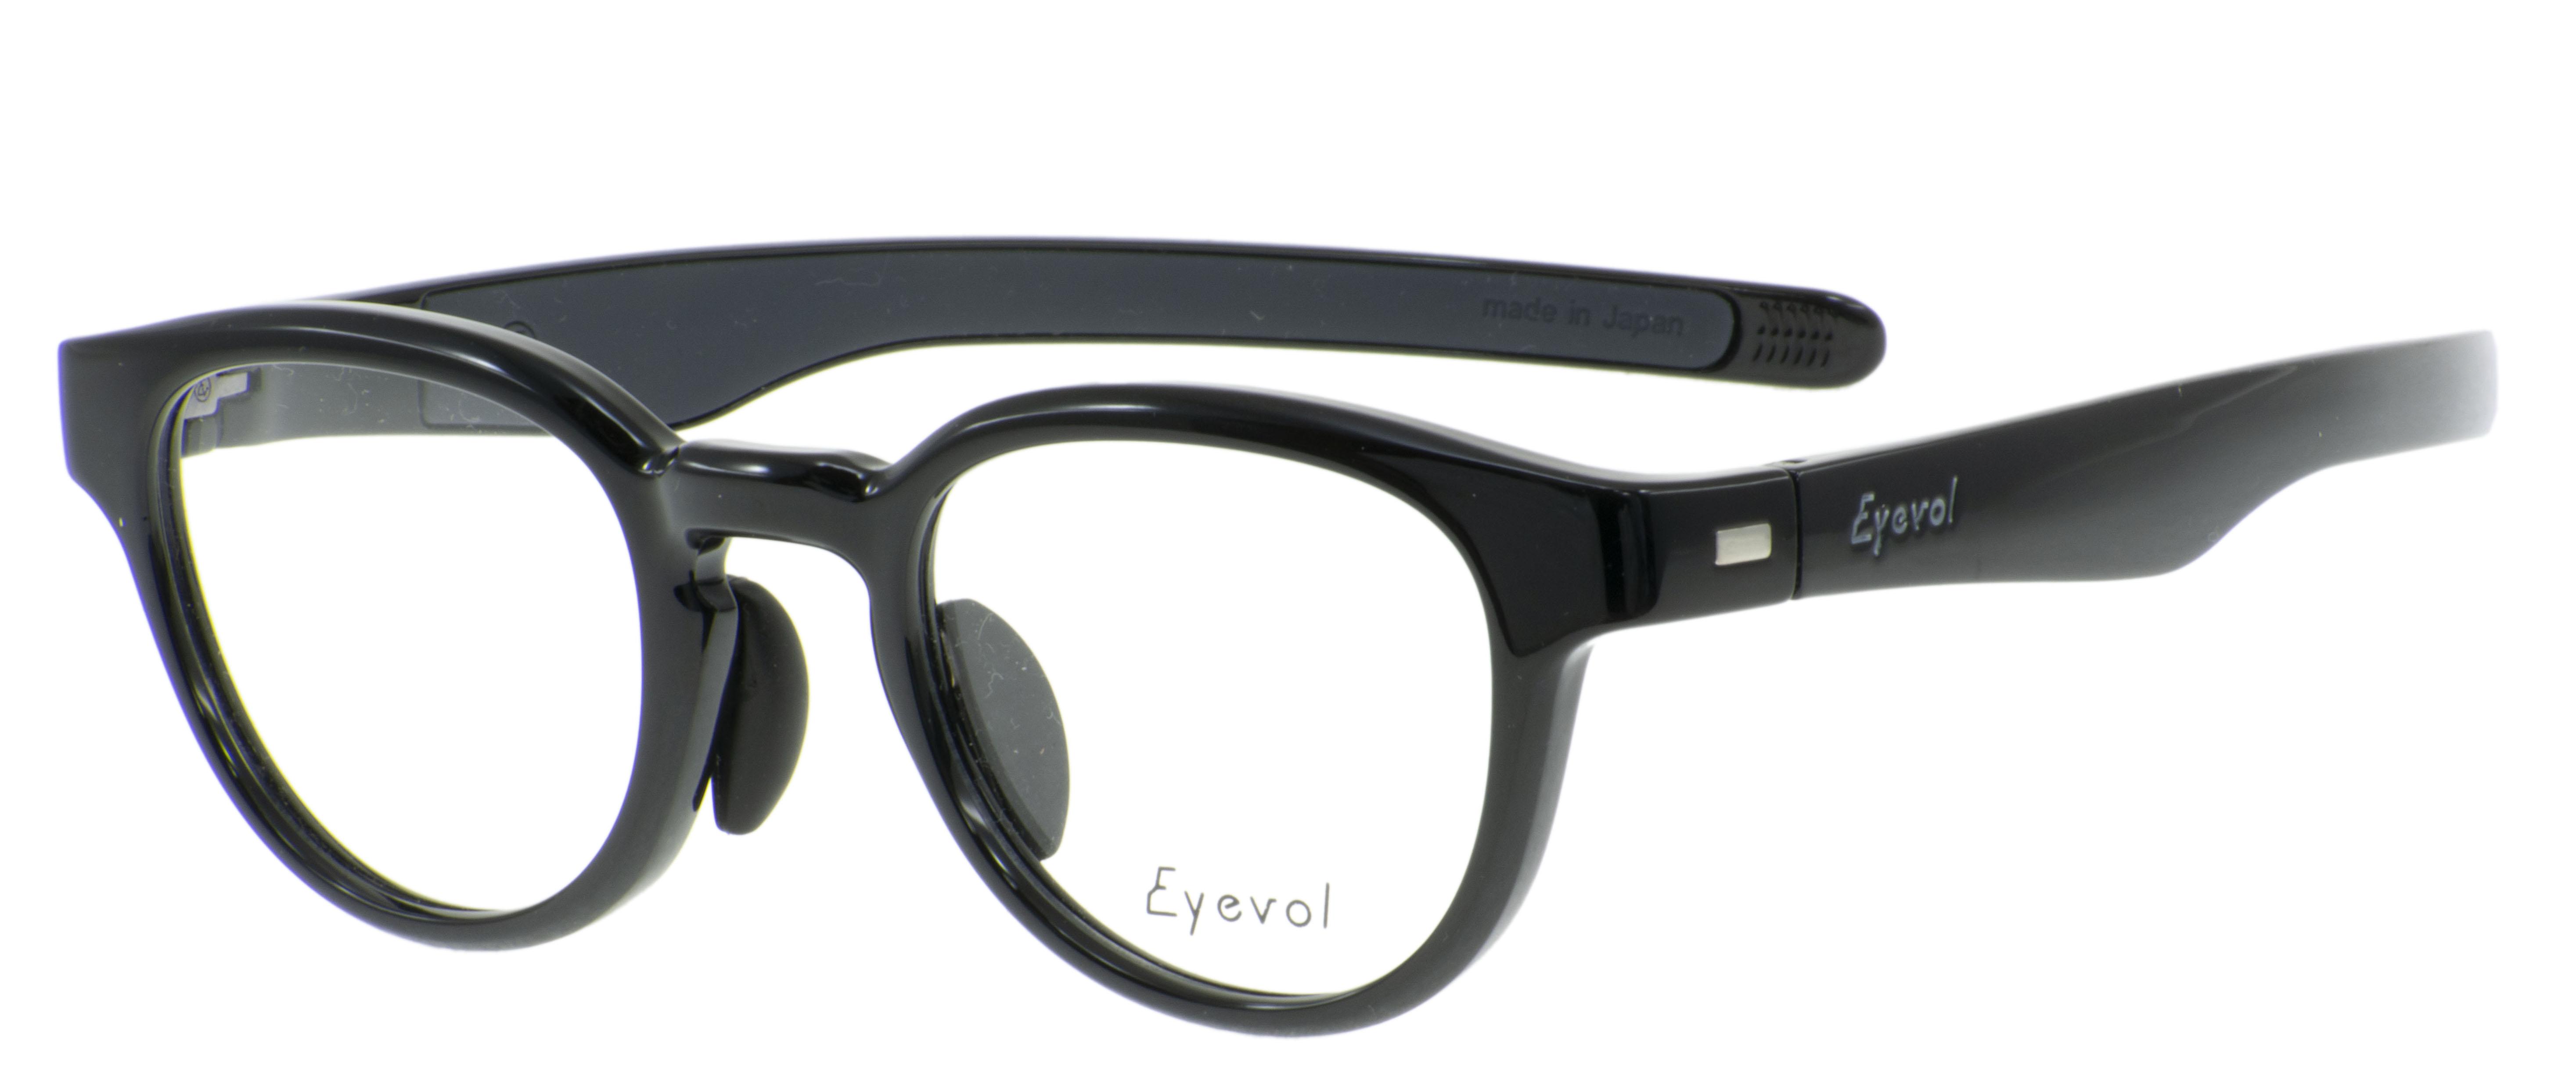 Eyevol BINGHAM 47 BK LG ¥20,000 02